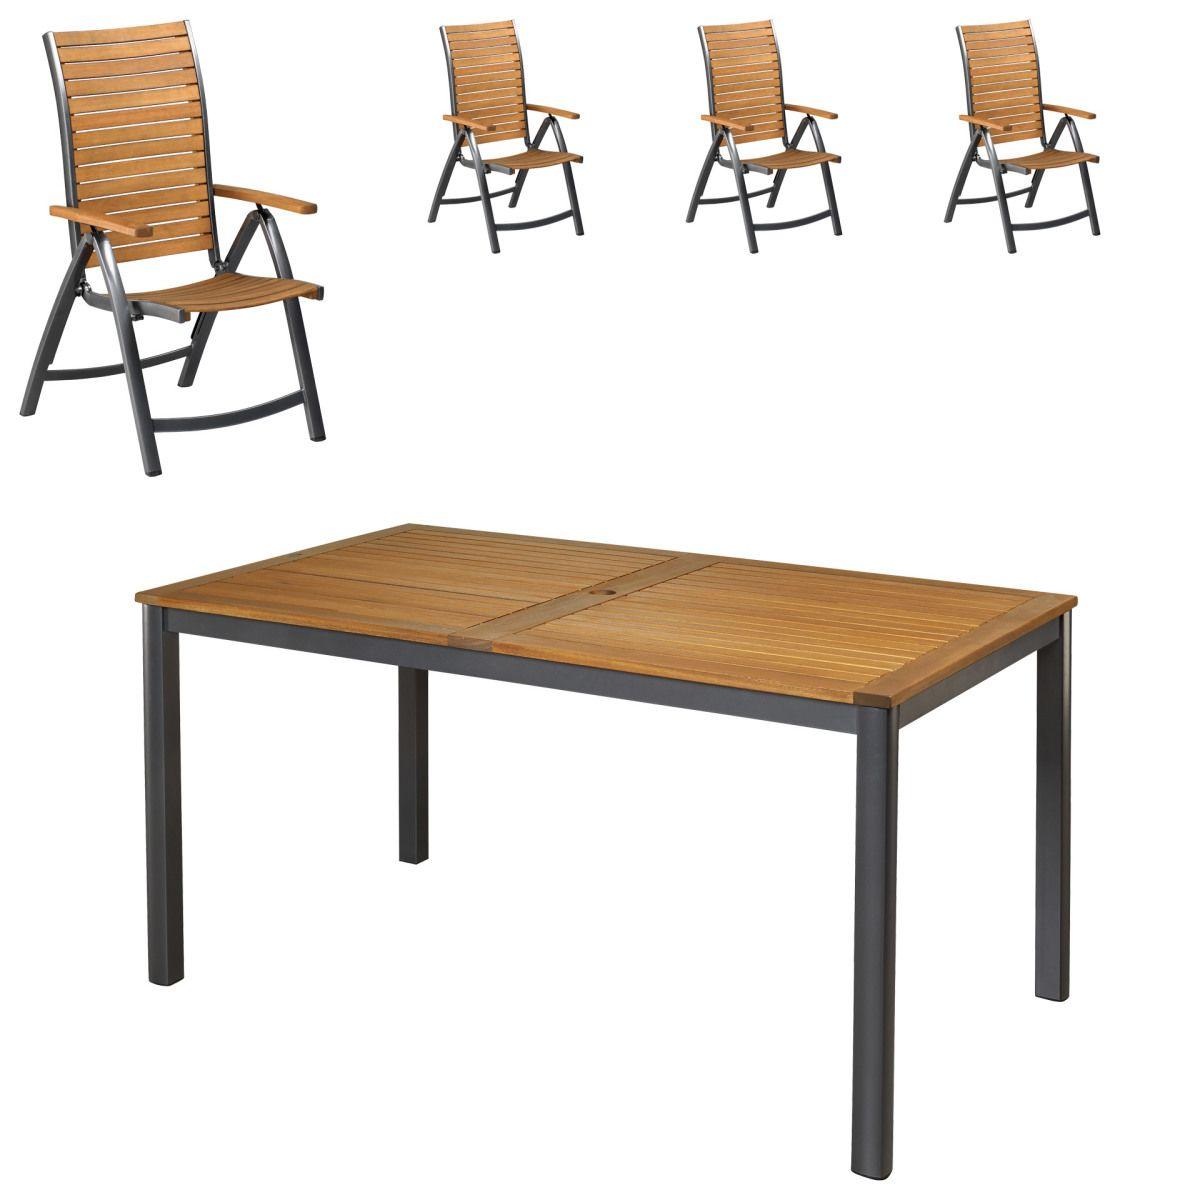 Gartenmöbel-Set San Francisco/Boston (89x150, 4 Stühle) Jetzt ...